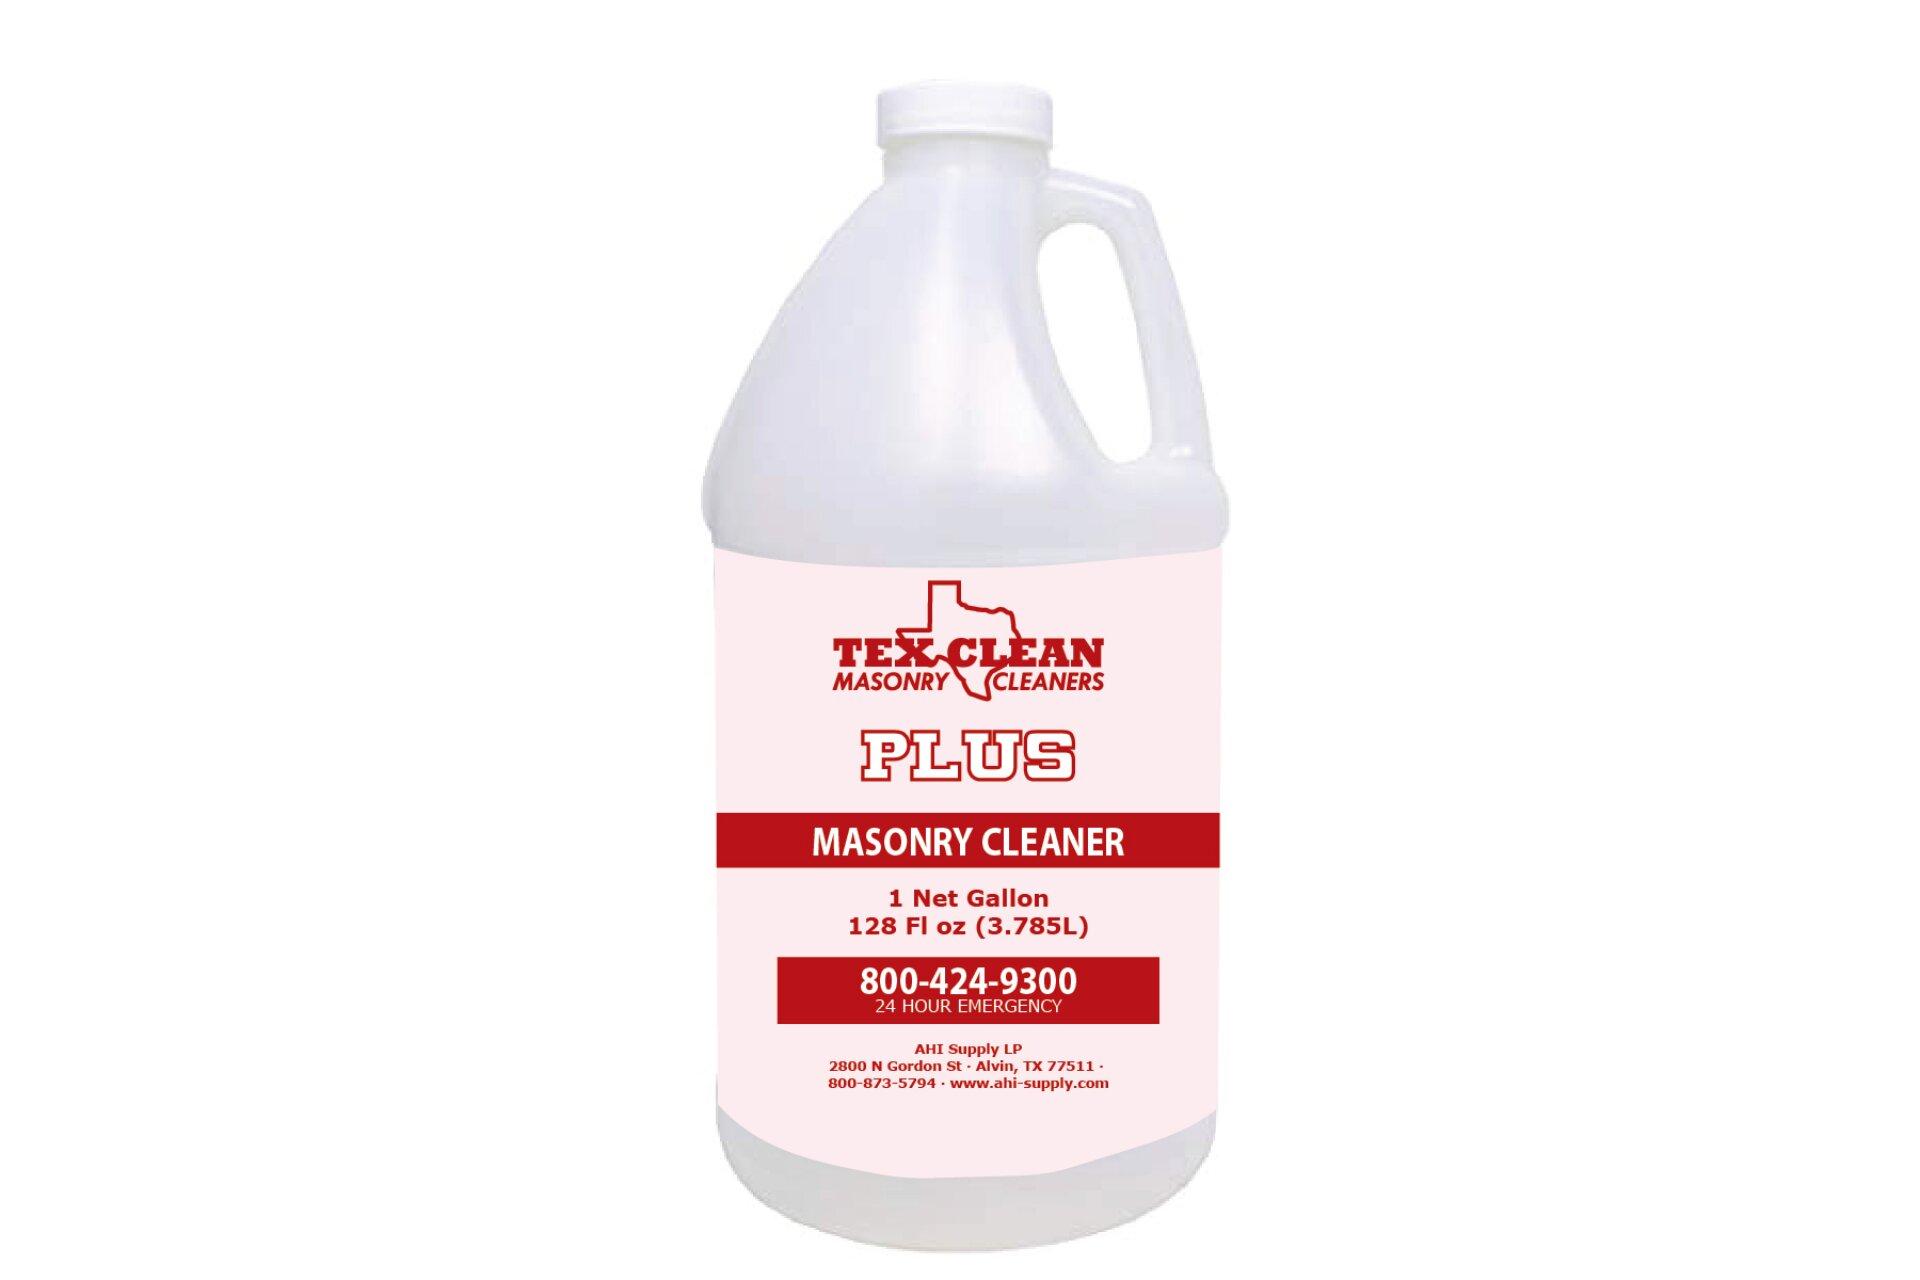 Tex Clean Plus Masonry Cleaner